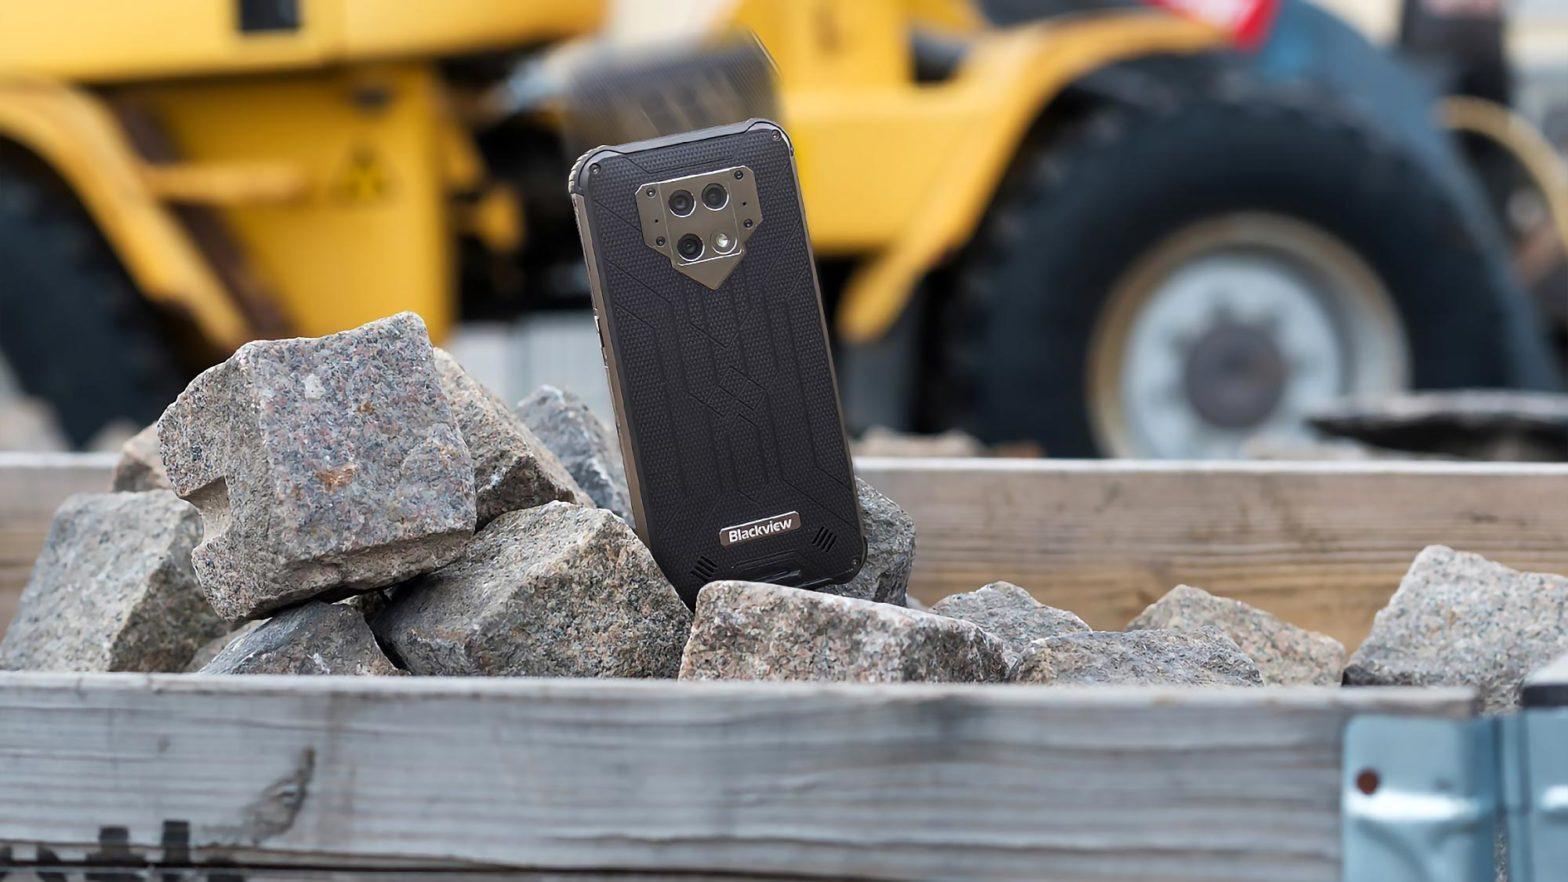 Blackview BV9800 Pro Rugged Phone with FLIR